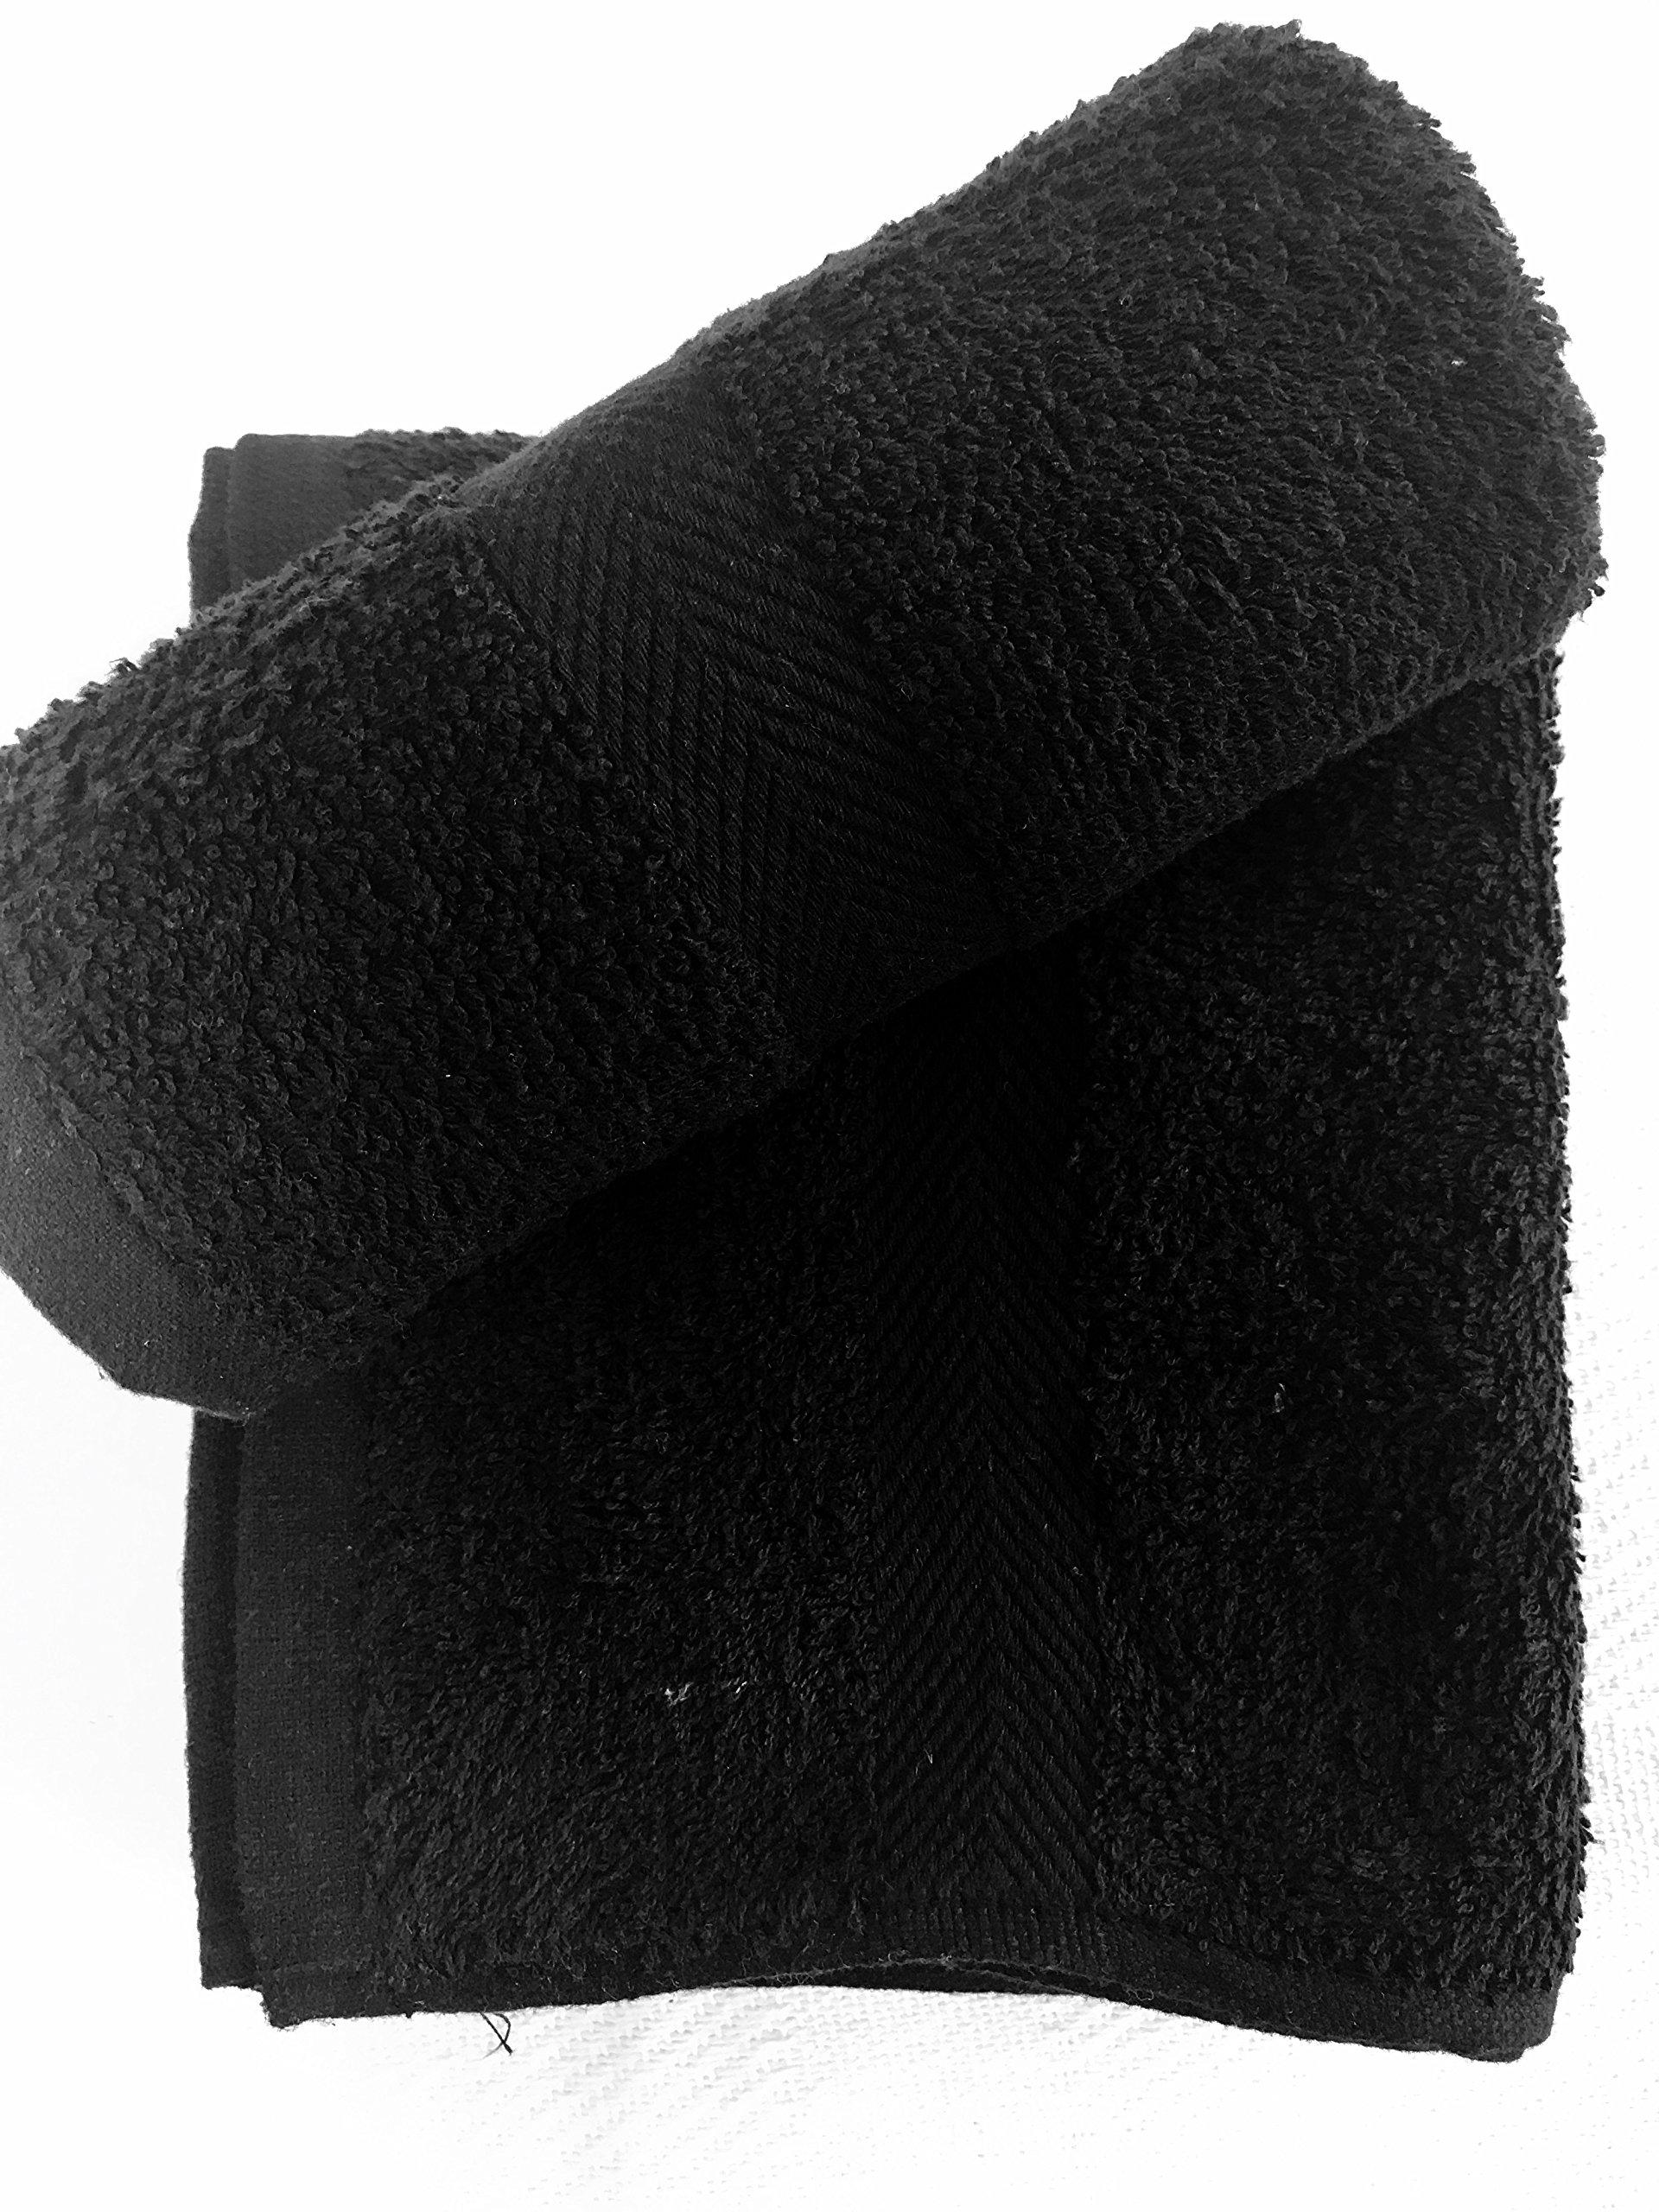 120 NEW BLACK SPA GYM SALON HAND TOWELS DOBBY BORDER RINGSPUN 100% COTTON 16X27 3LBS